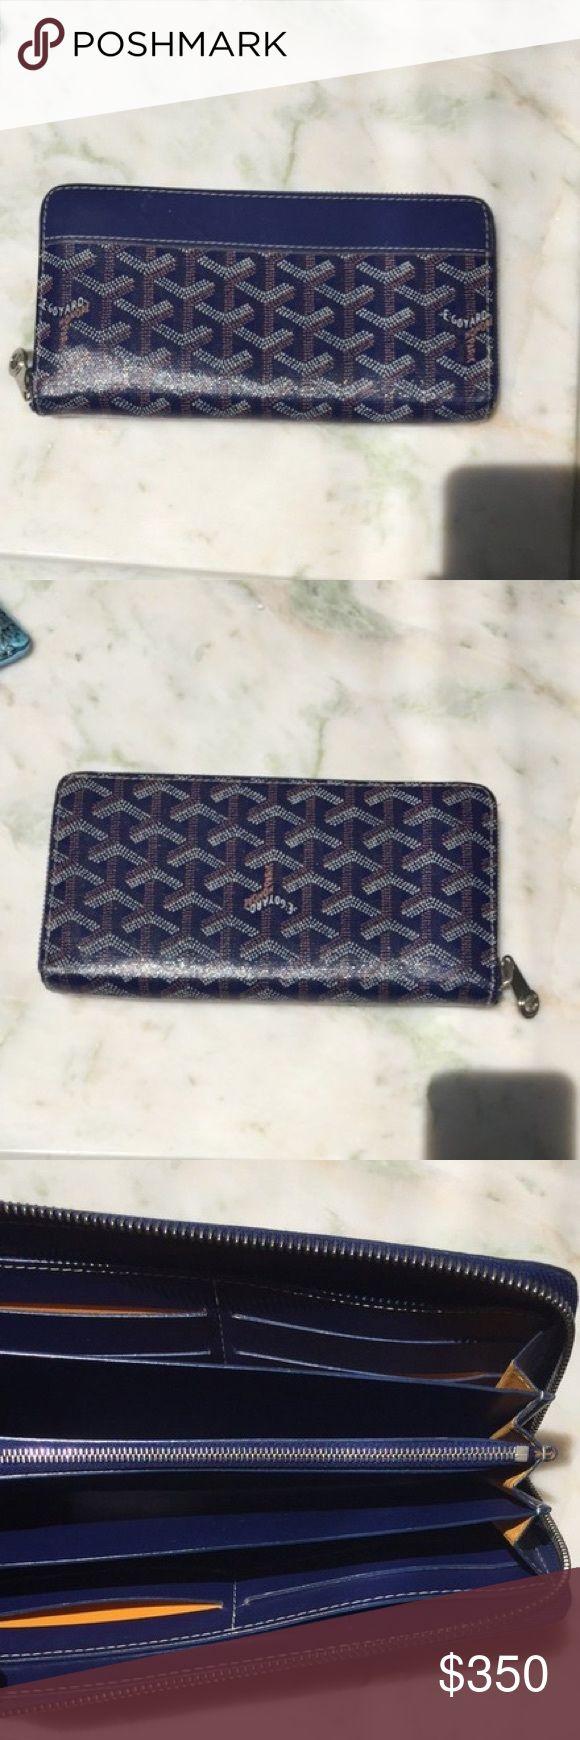 Goyard wallet 8 card slots. 2 pockets. 1 coin purse. 4 bill slots. Amazing condition Goyard Bags Wallets